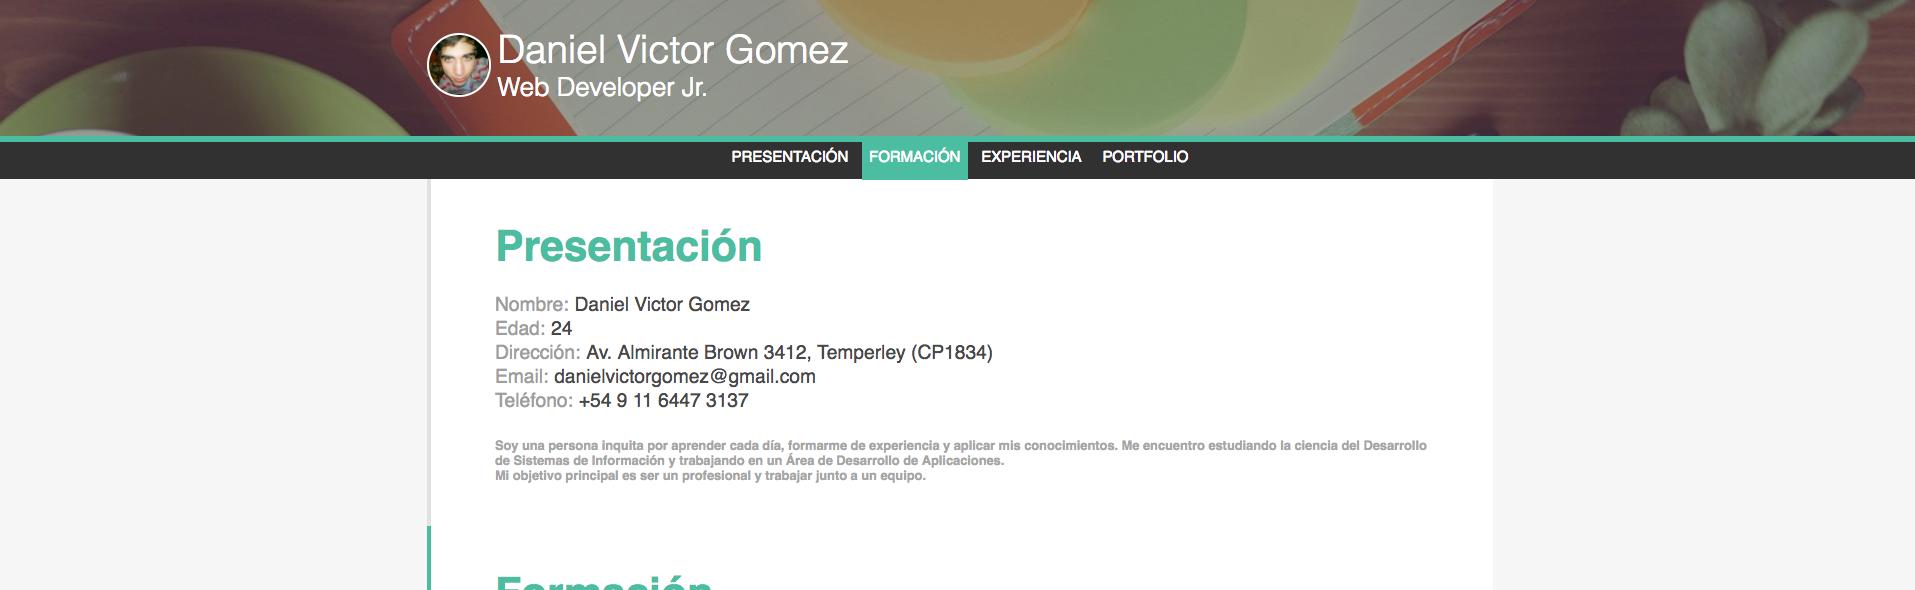 Acamica - Daniel Gomez - CV Online